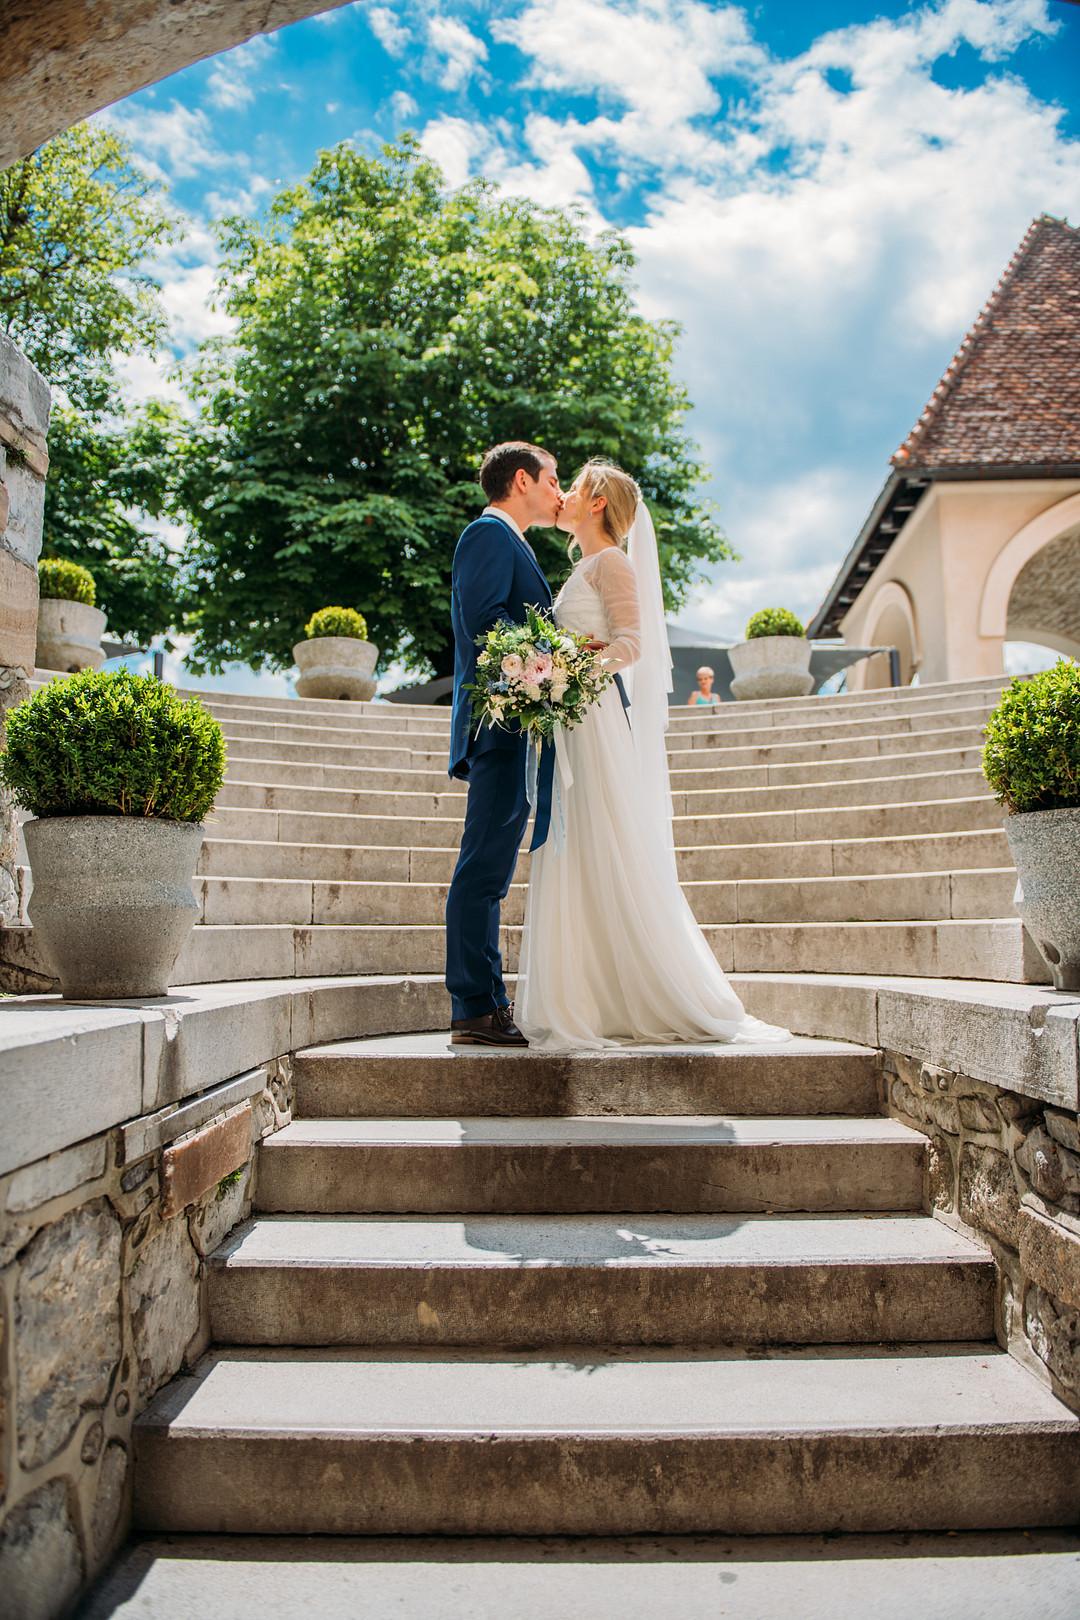 Wedding on Lake Bled, Intimate Destination Wedding on Lake Bled